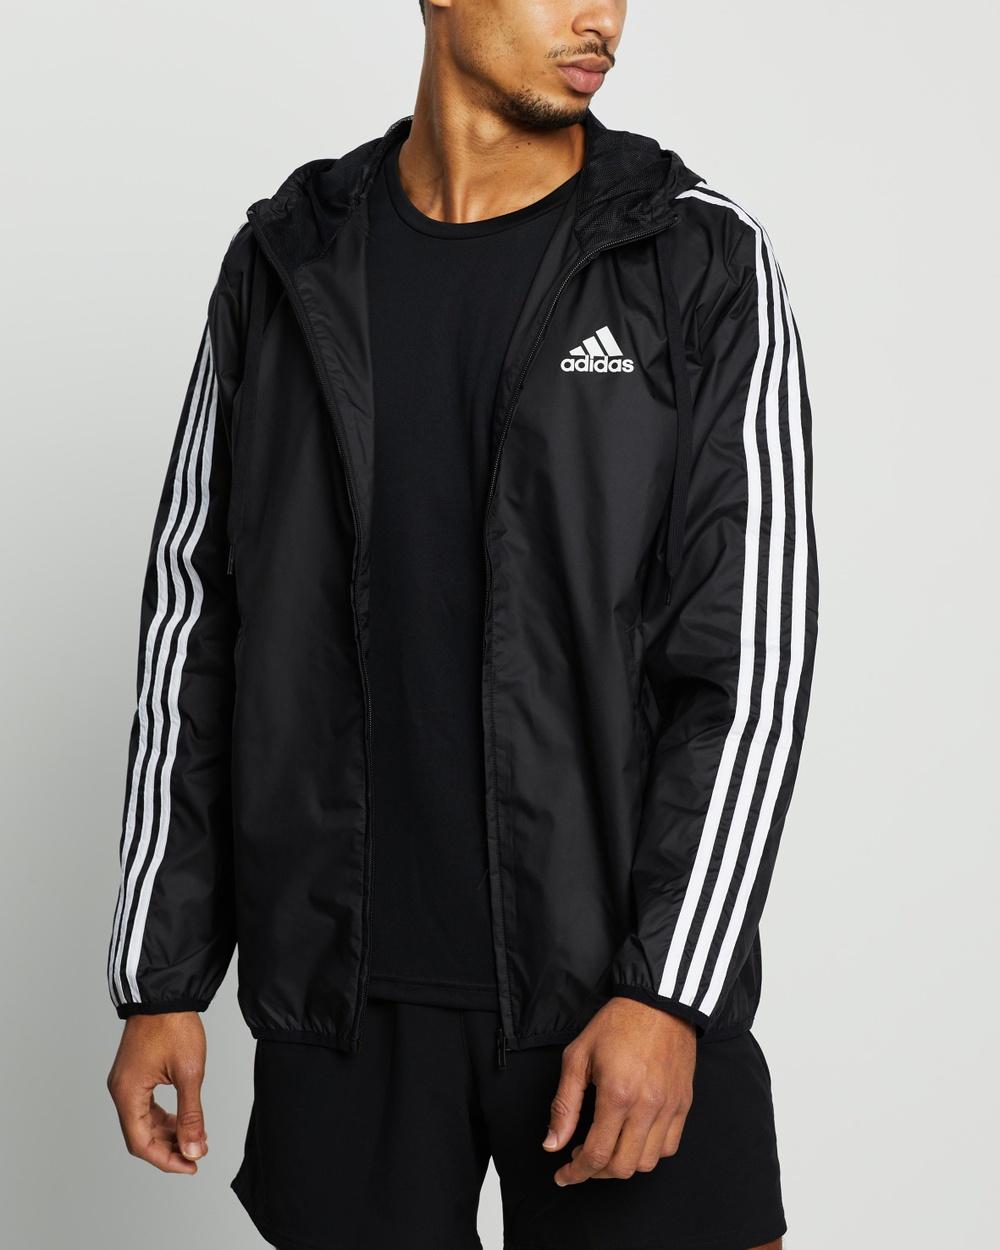 adidas Performance Essentials 3 Stripes Wind Breaker Coats & Jackets Black 3-Stripes